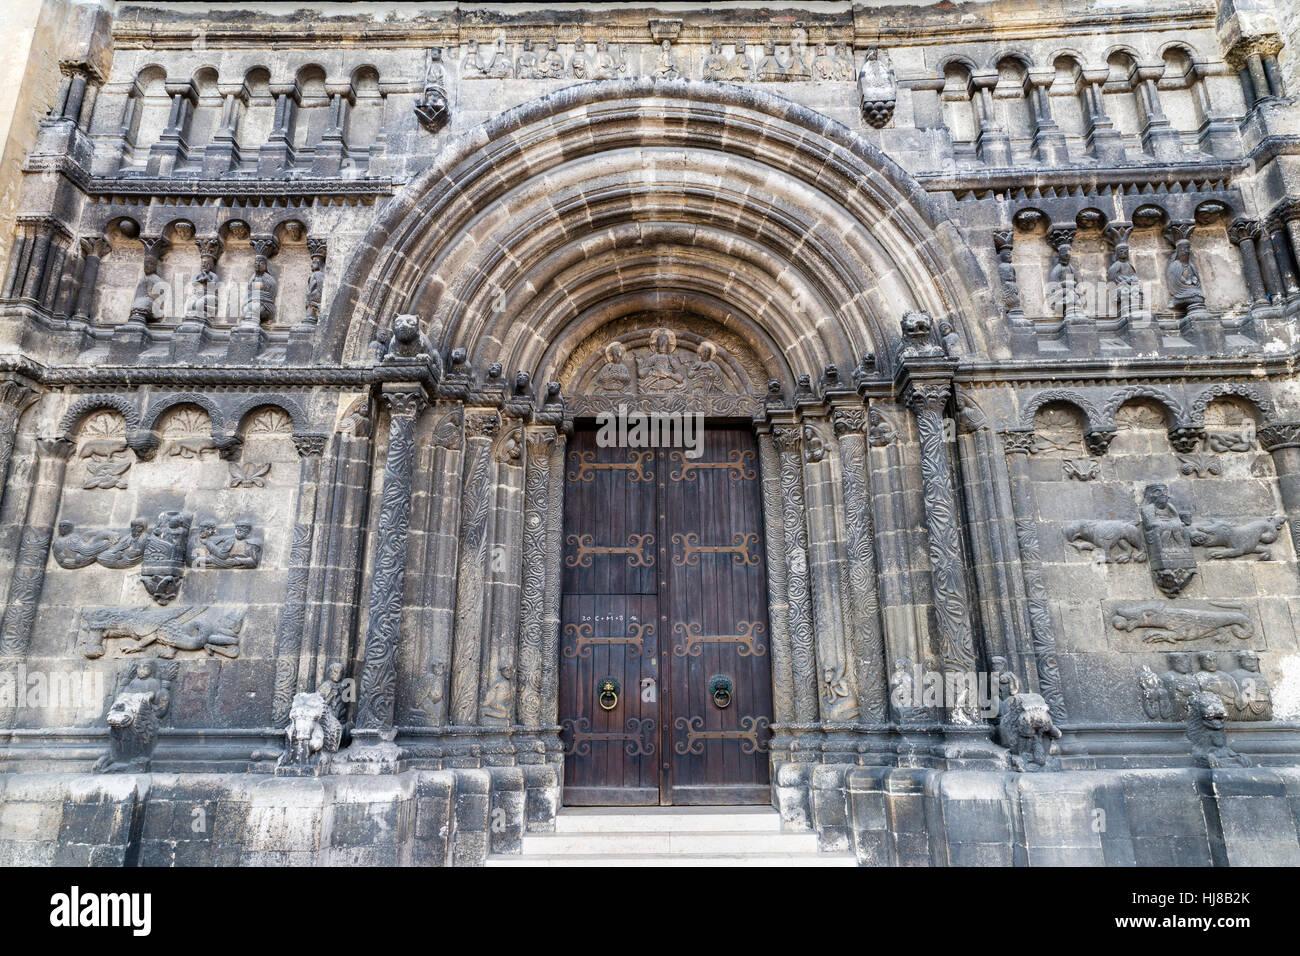 Schottenportal, Nordportal, Romantik, Scots Kloster oder Sankt Jacob Church, Regensburg, Oberpfalz, Bayern, Deutschland Stockbild